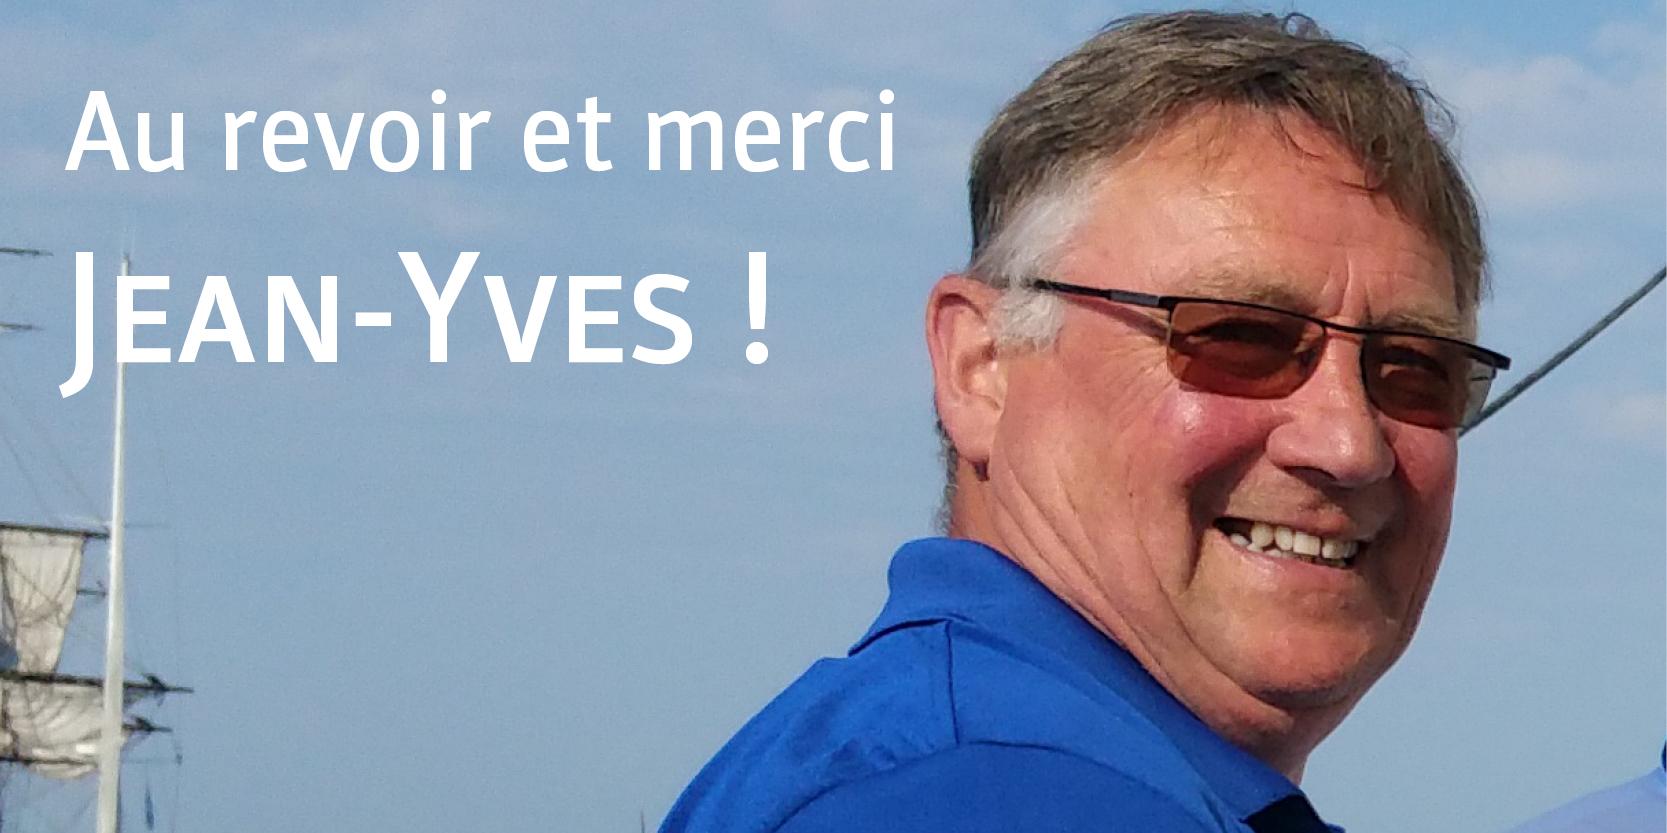 Jean-Yves